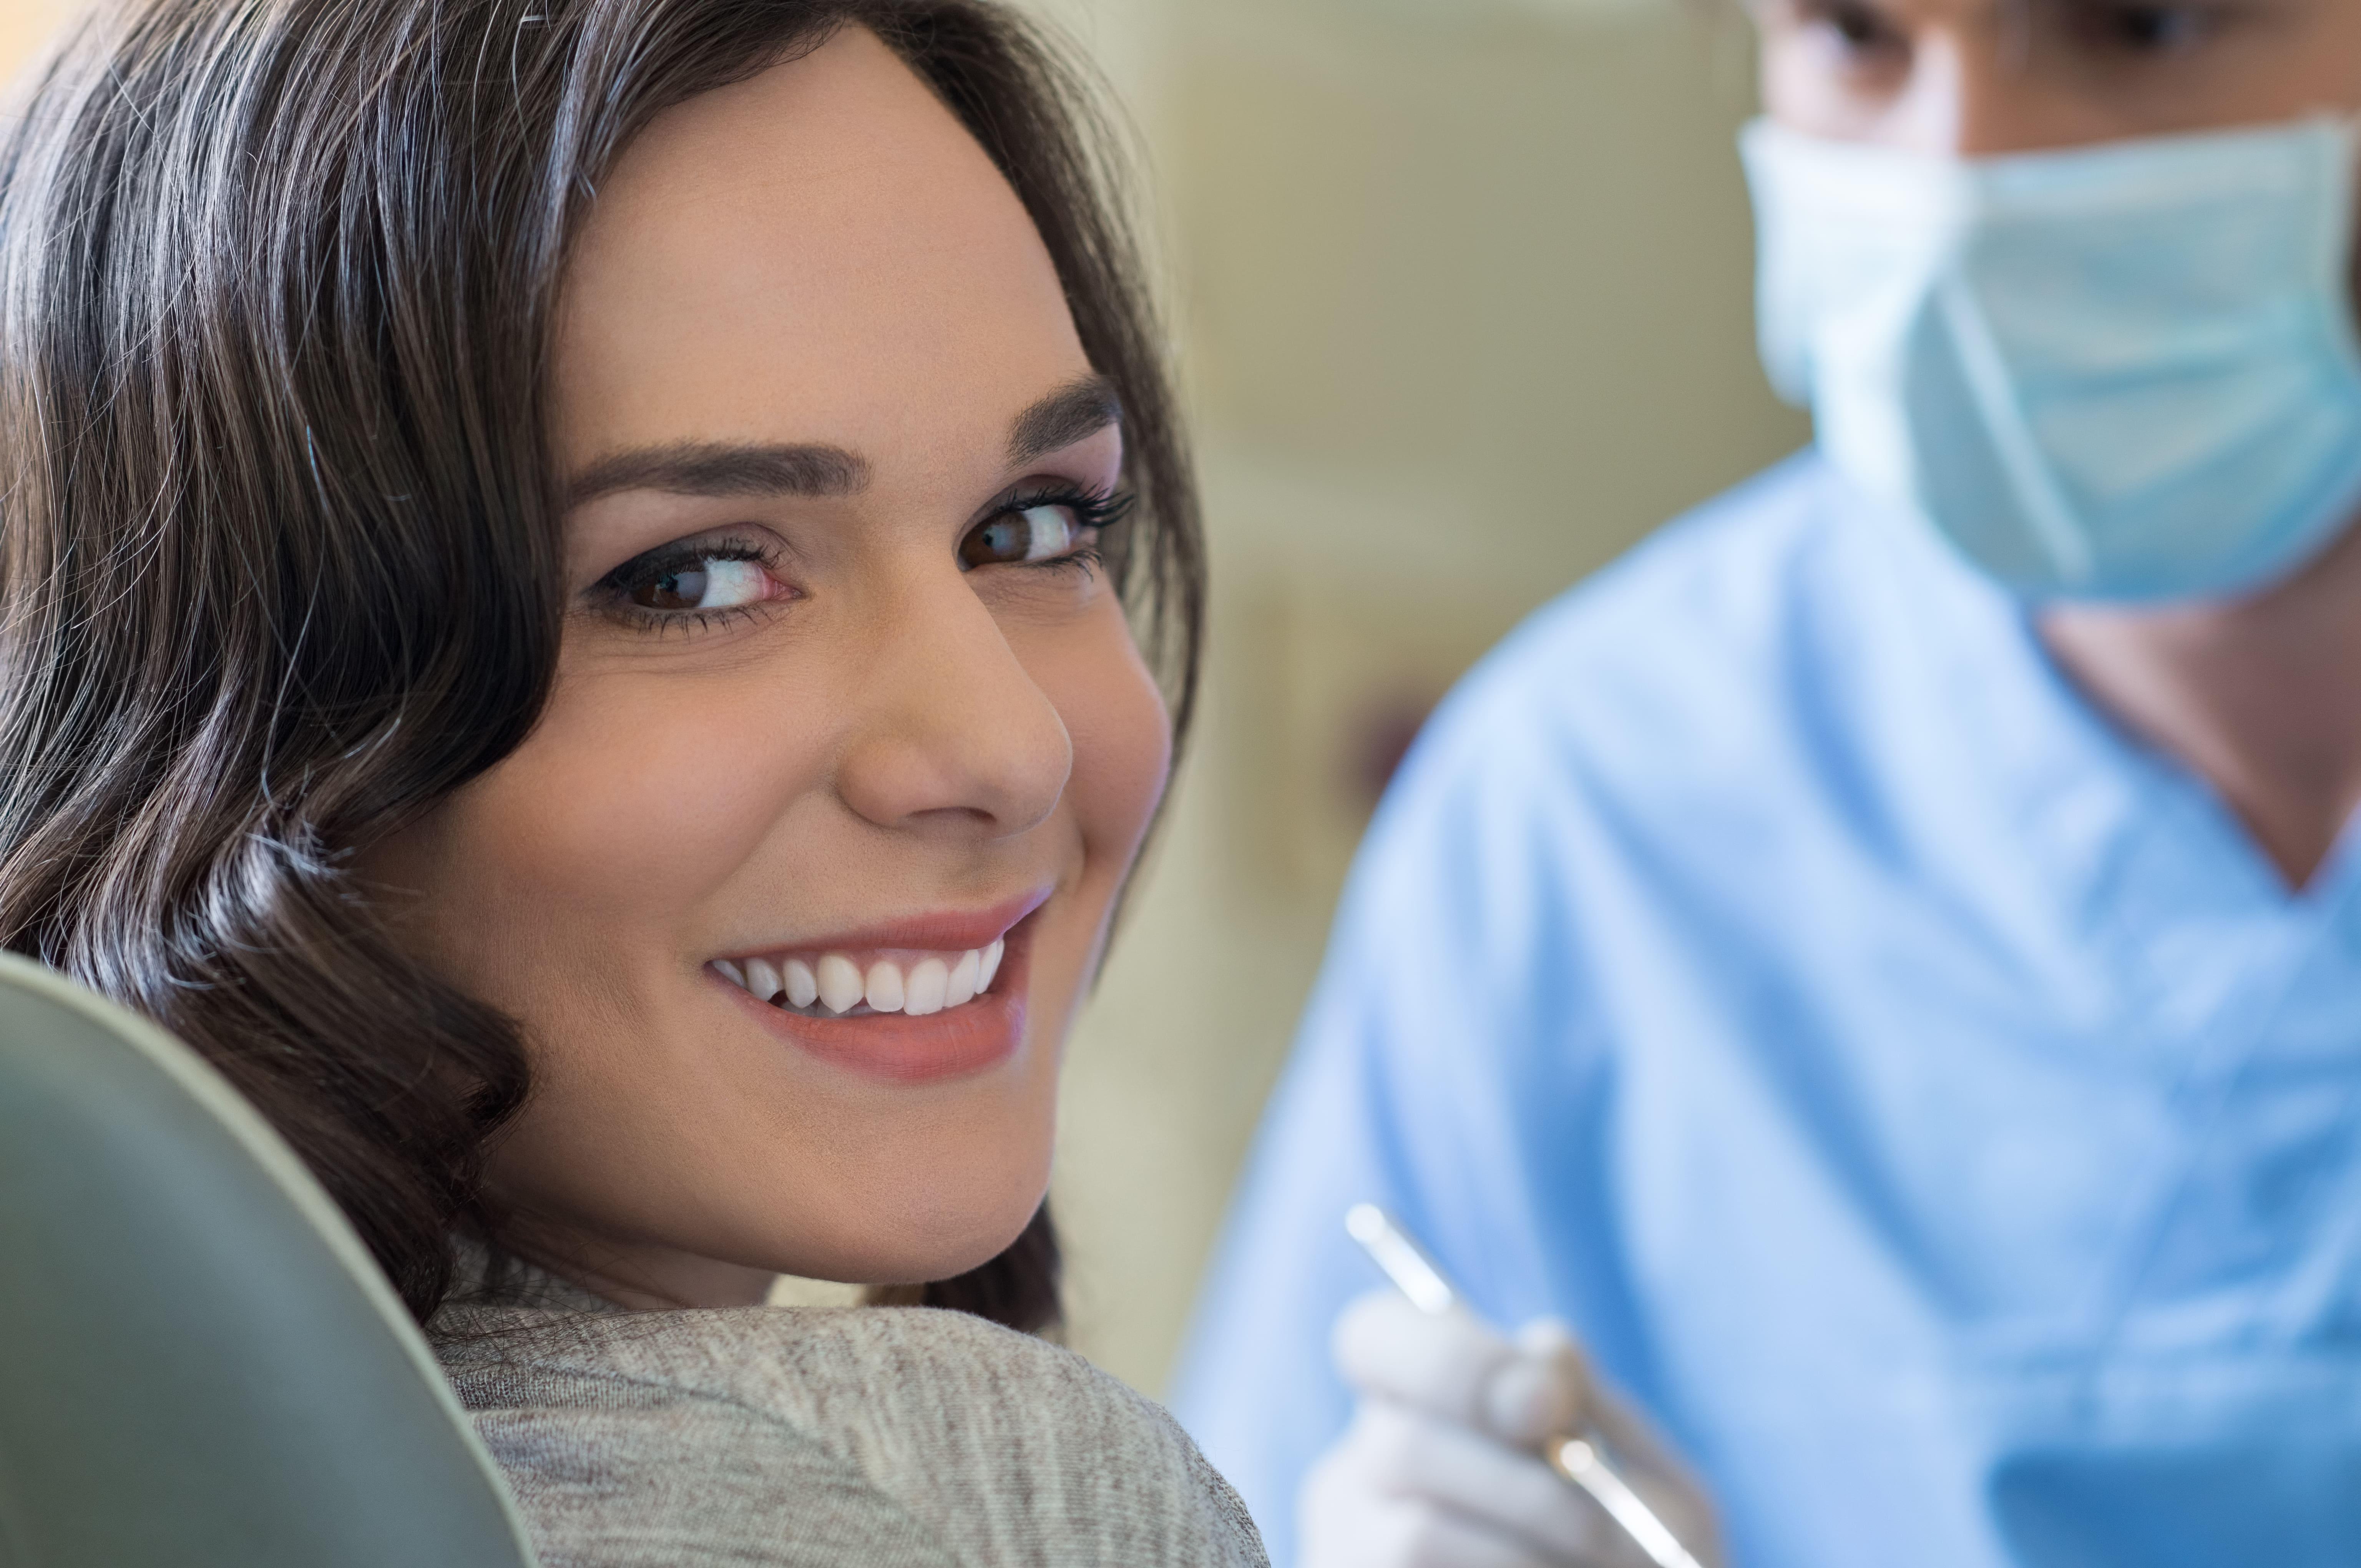 woman in a dental clinic